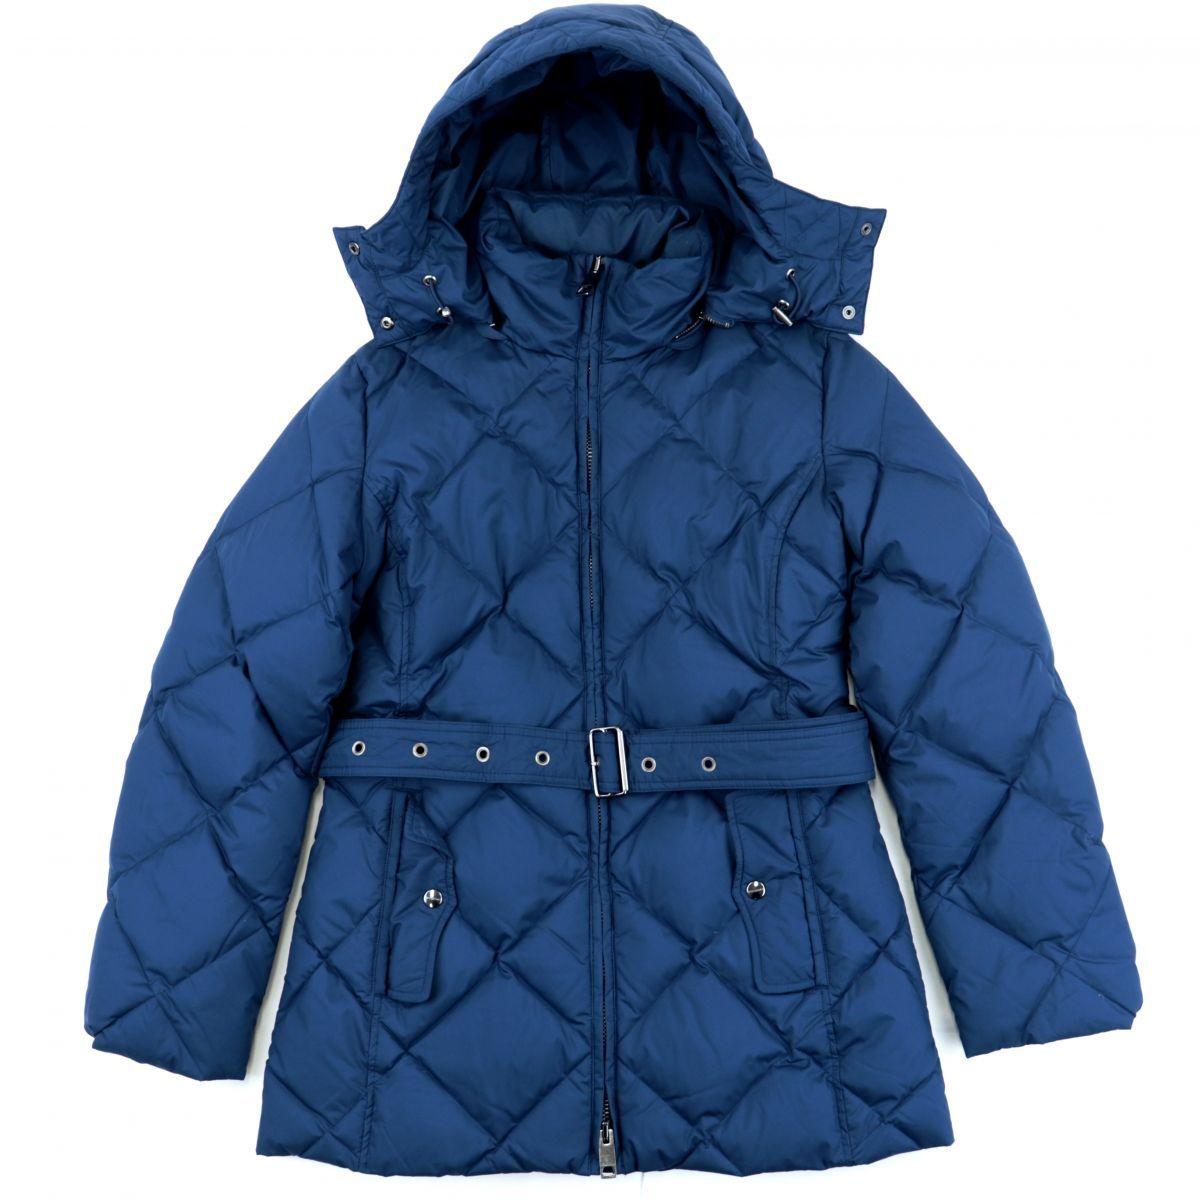 Burberry Down Coat Women's Blue S Lining Plaid Zip Up Belt